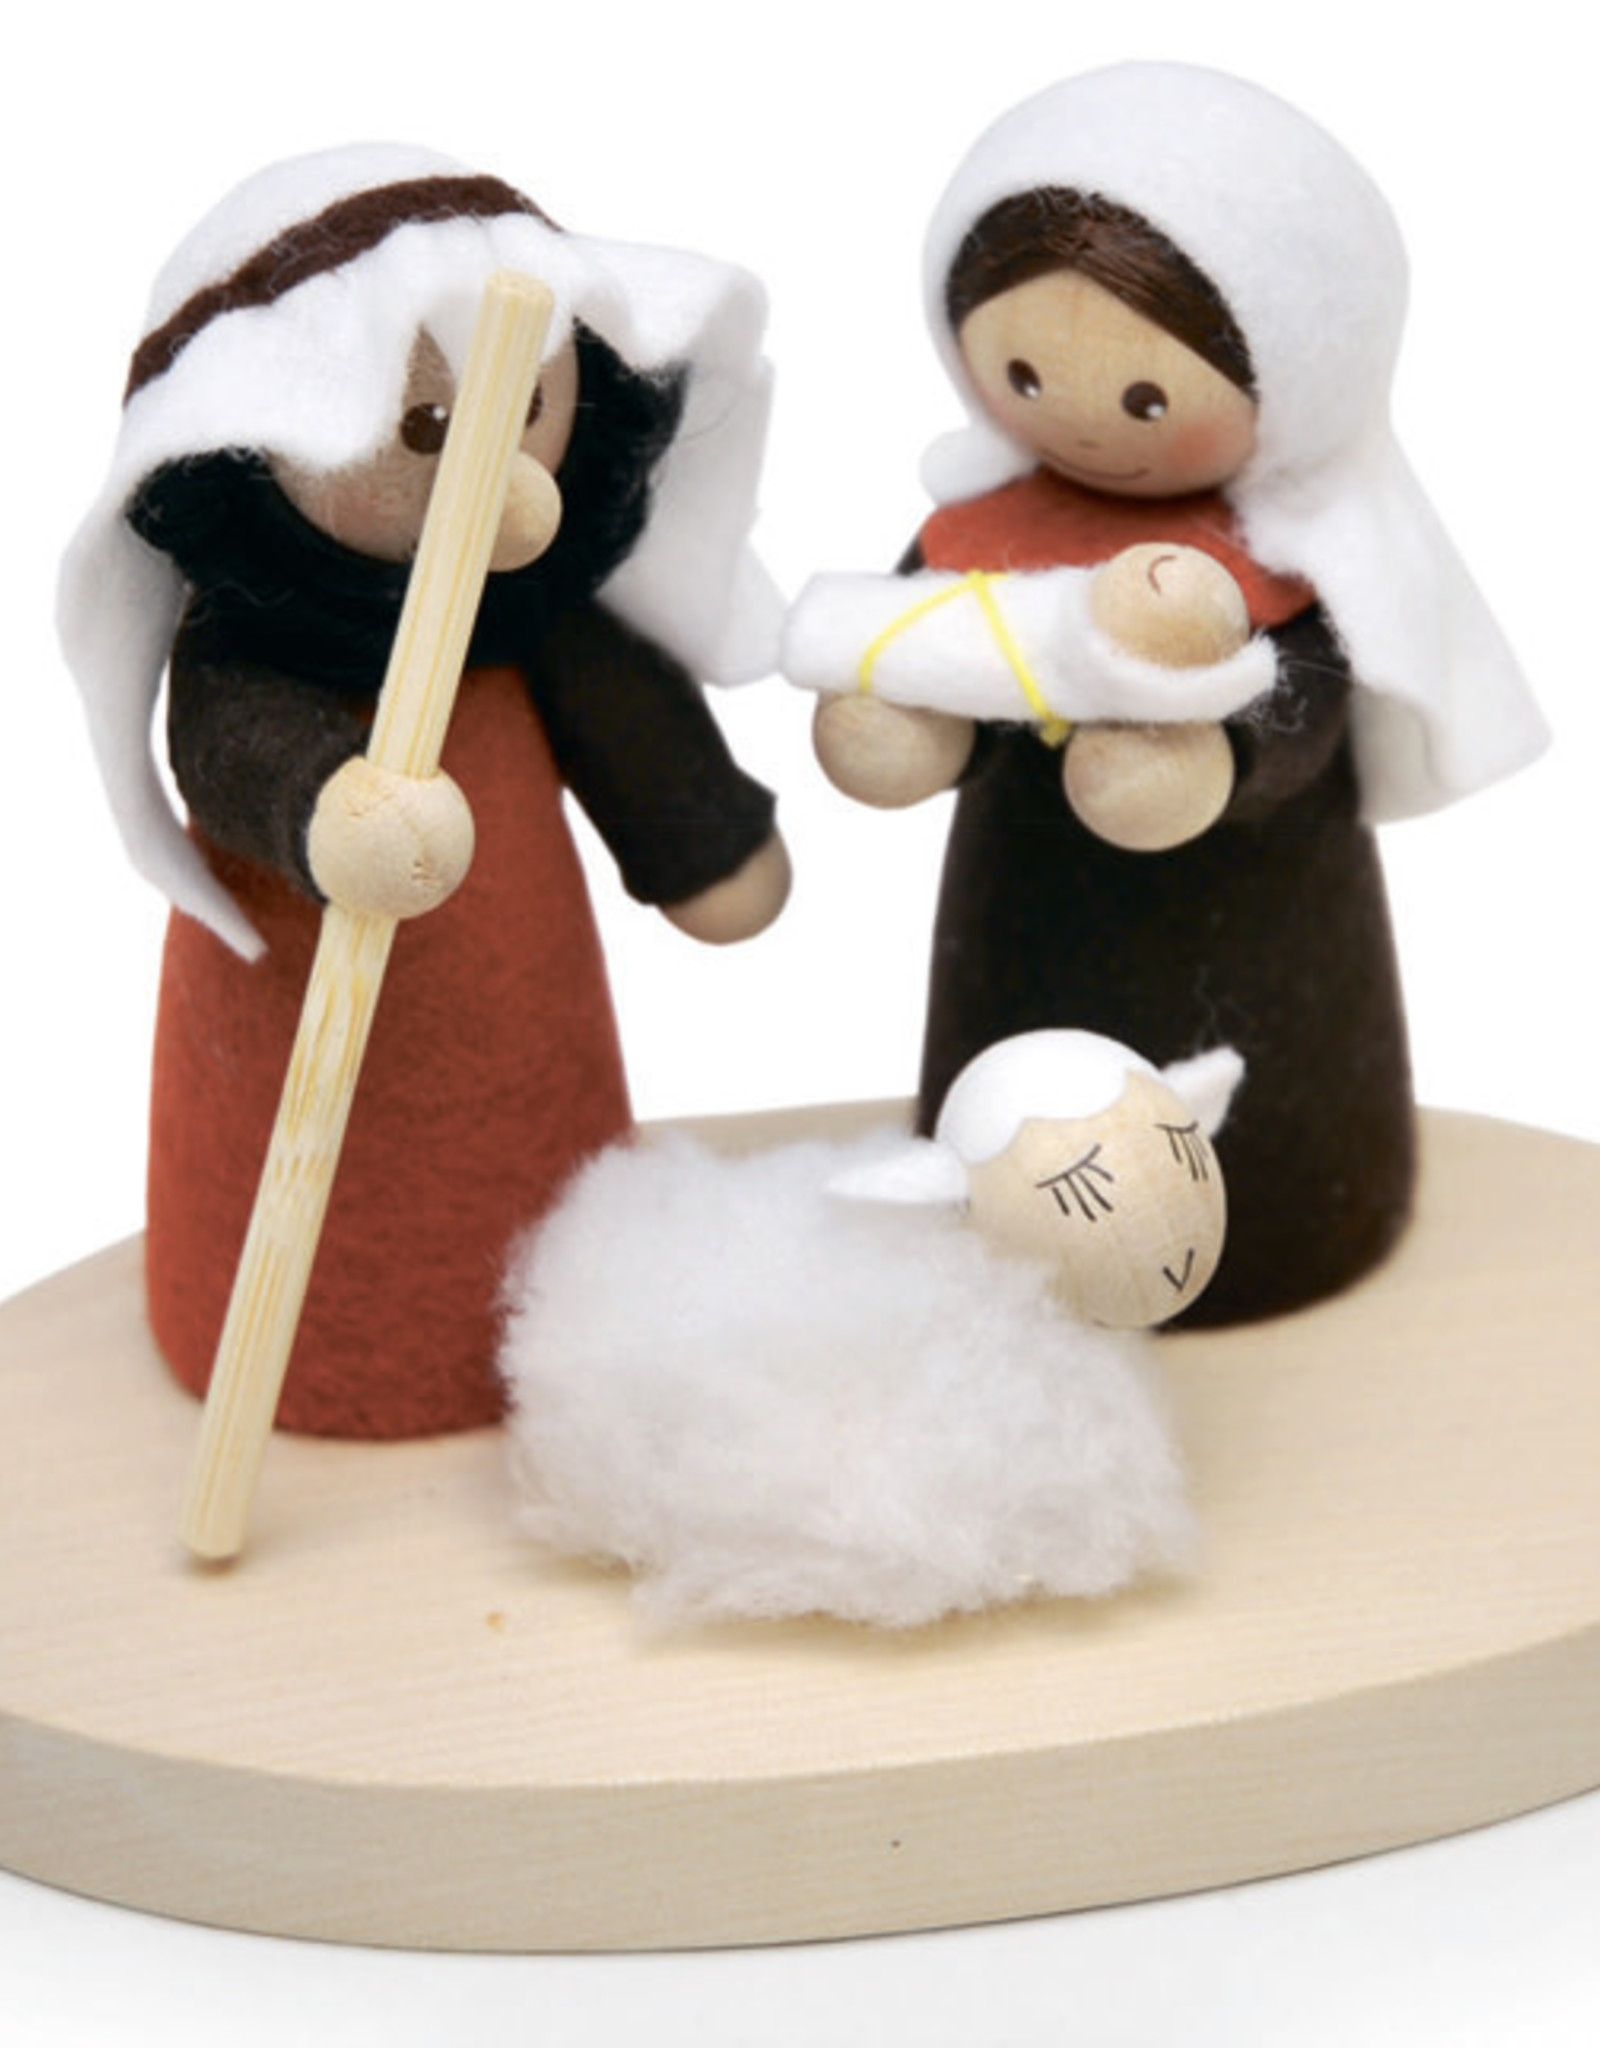 Nordic Dreams Small Nativity Set